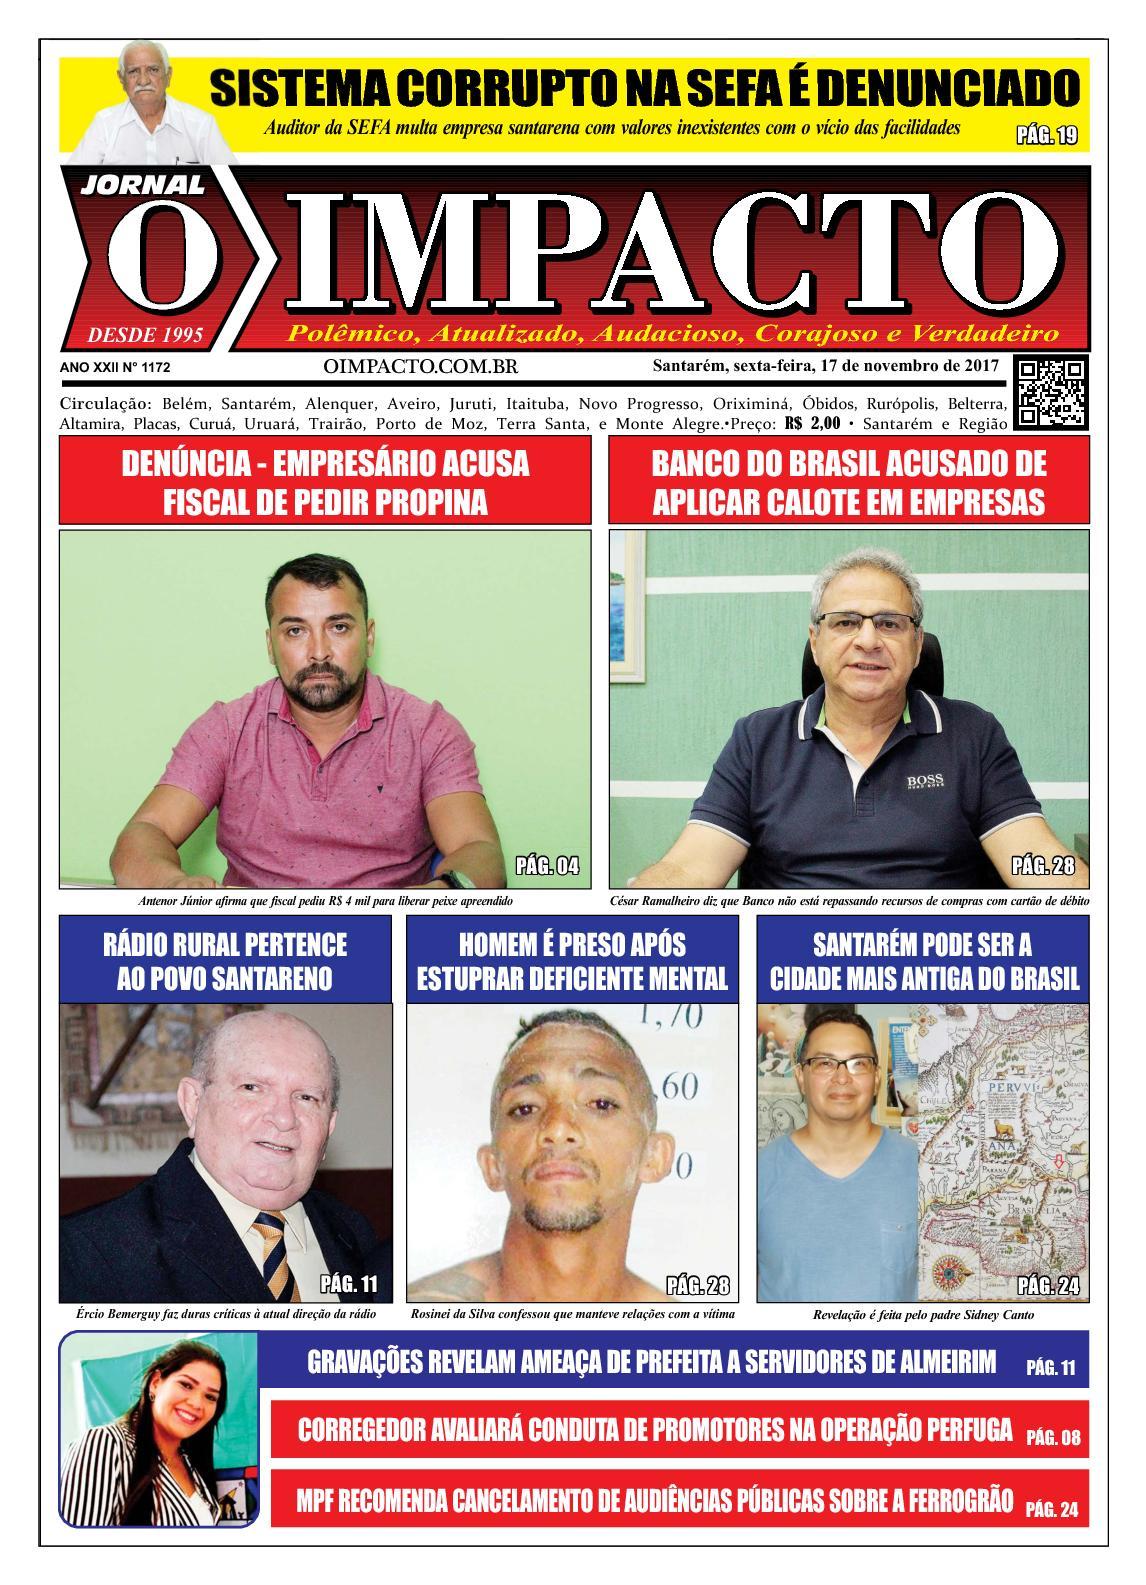 Anelise Pelada calaméo - jornal o impacto ed. 1172